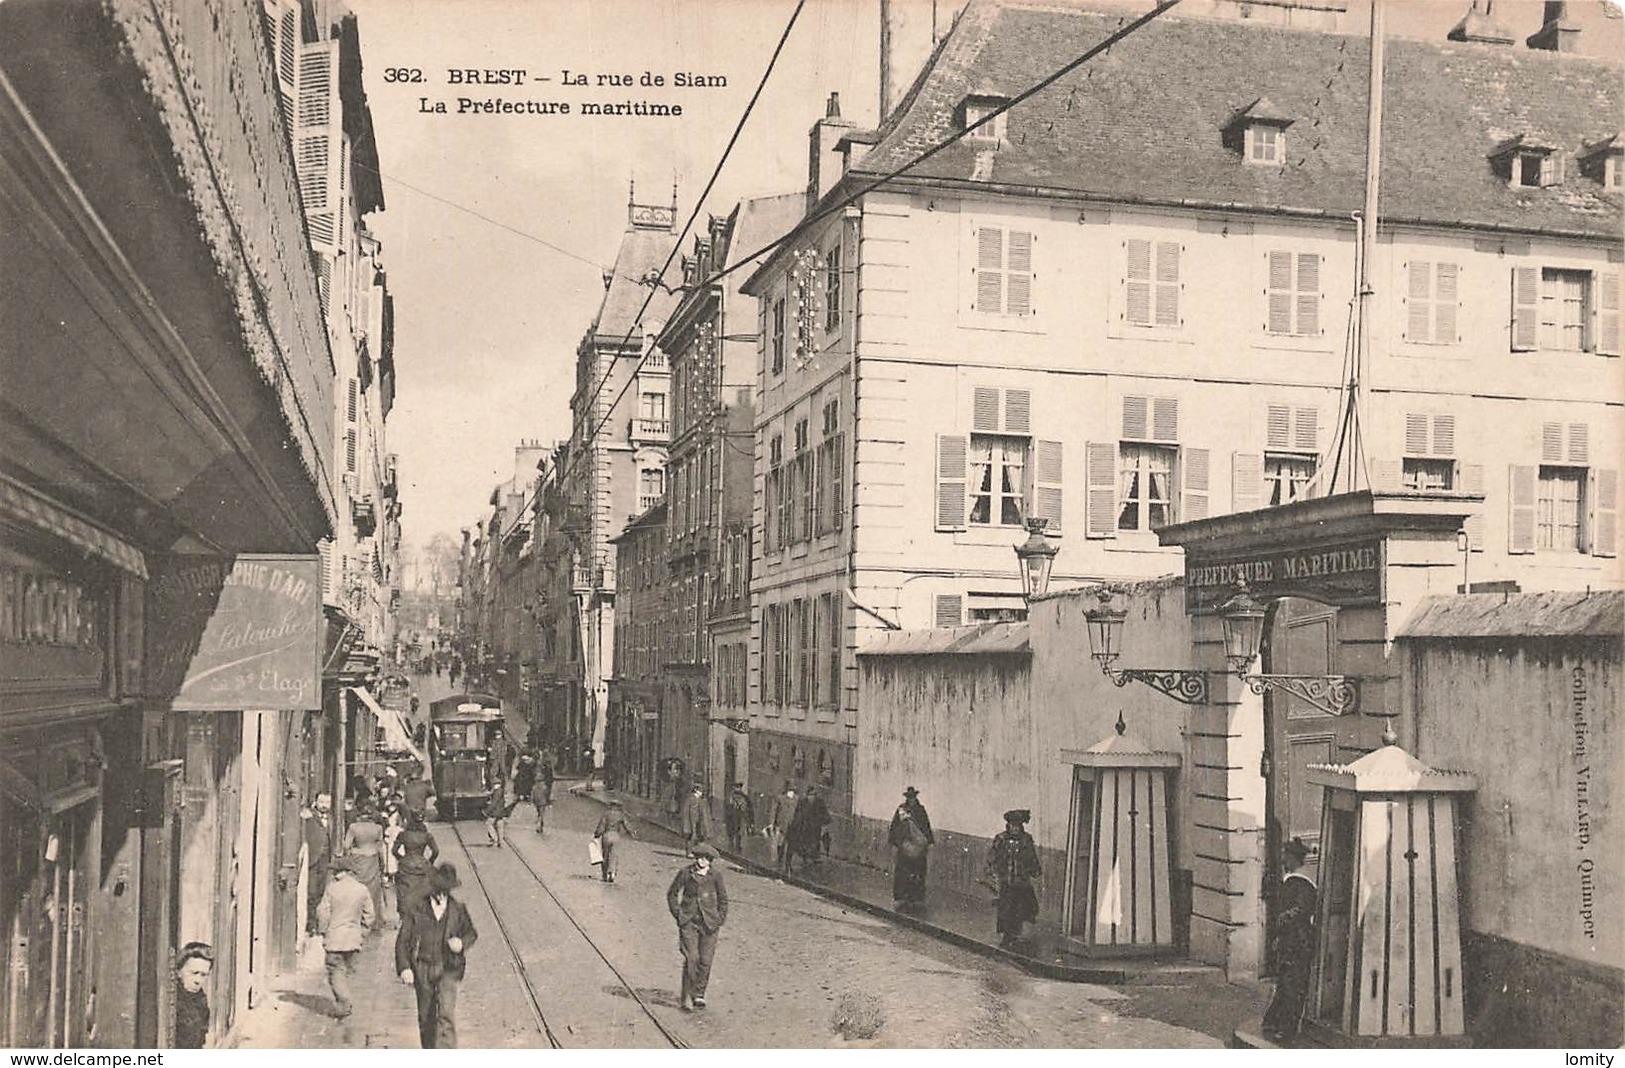 Tram Tramway Brest La Rue De Siam La Préfecture Maritime Cpa Carte Animée - Tramways